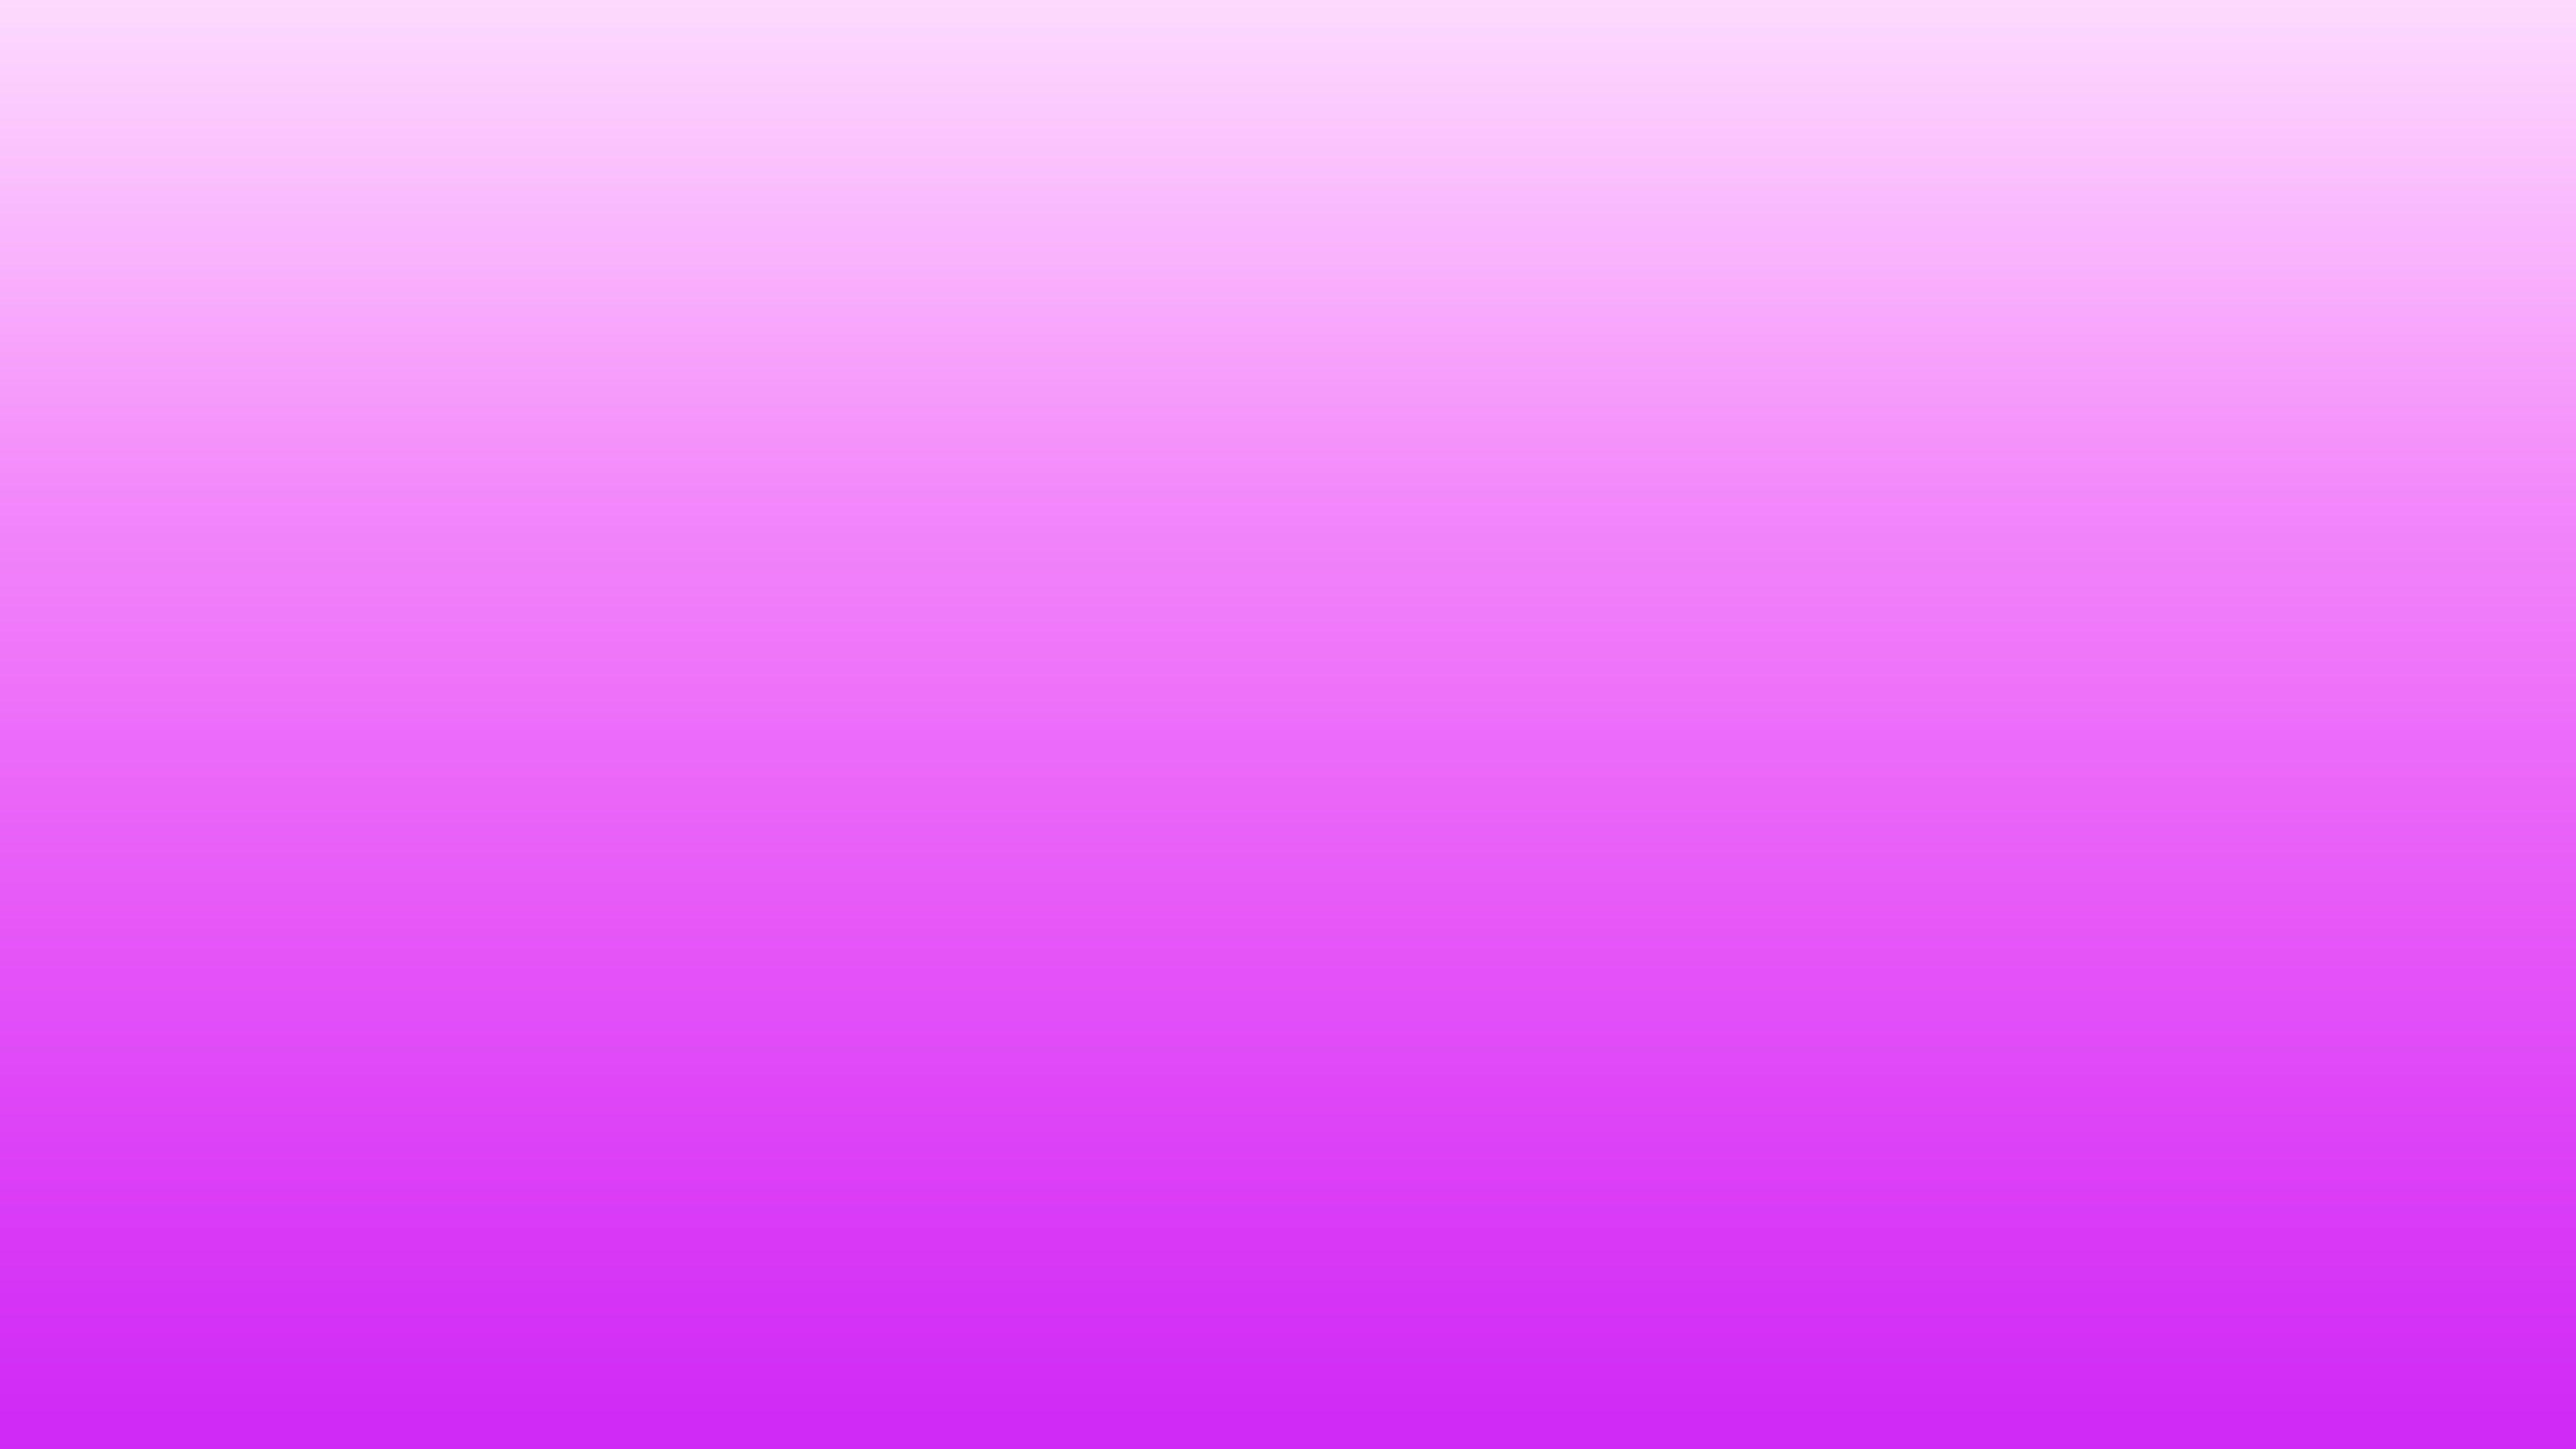 Wallpaper roxo Background roxo Plano de fundo roxo